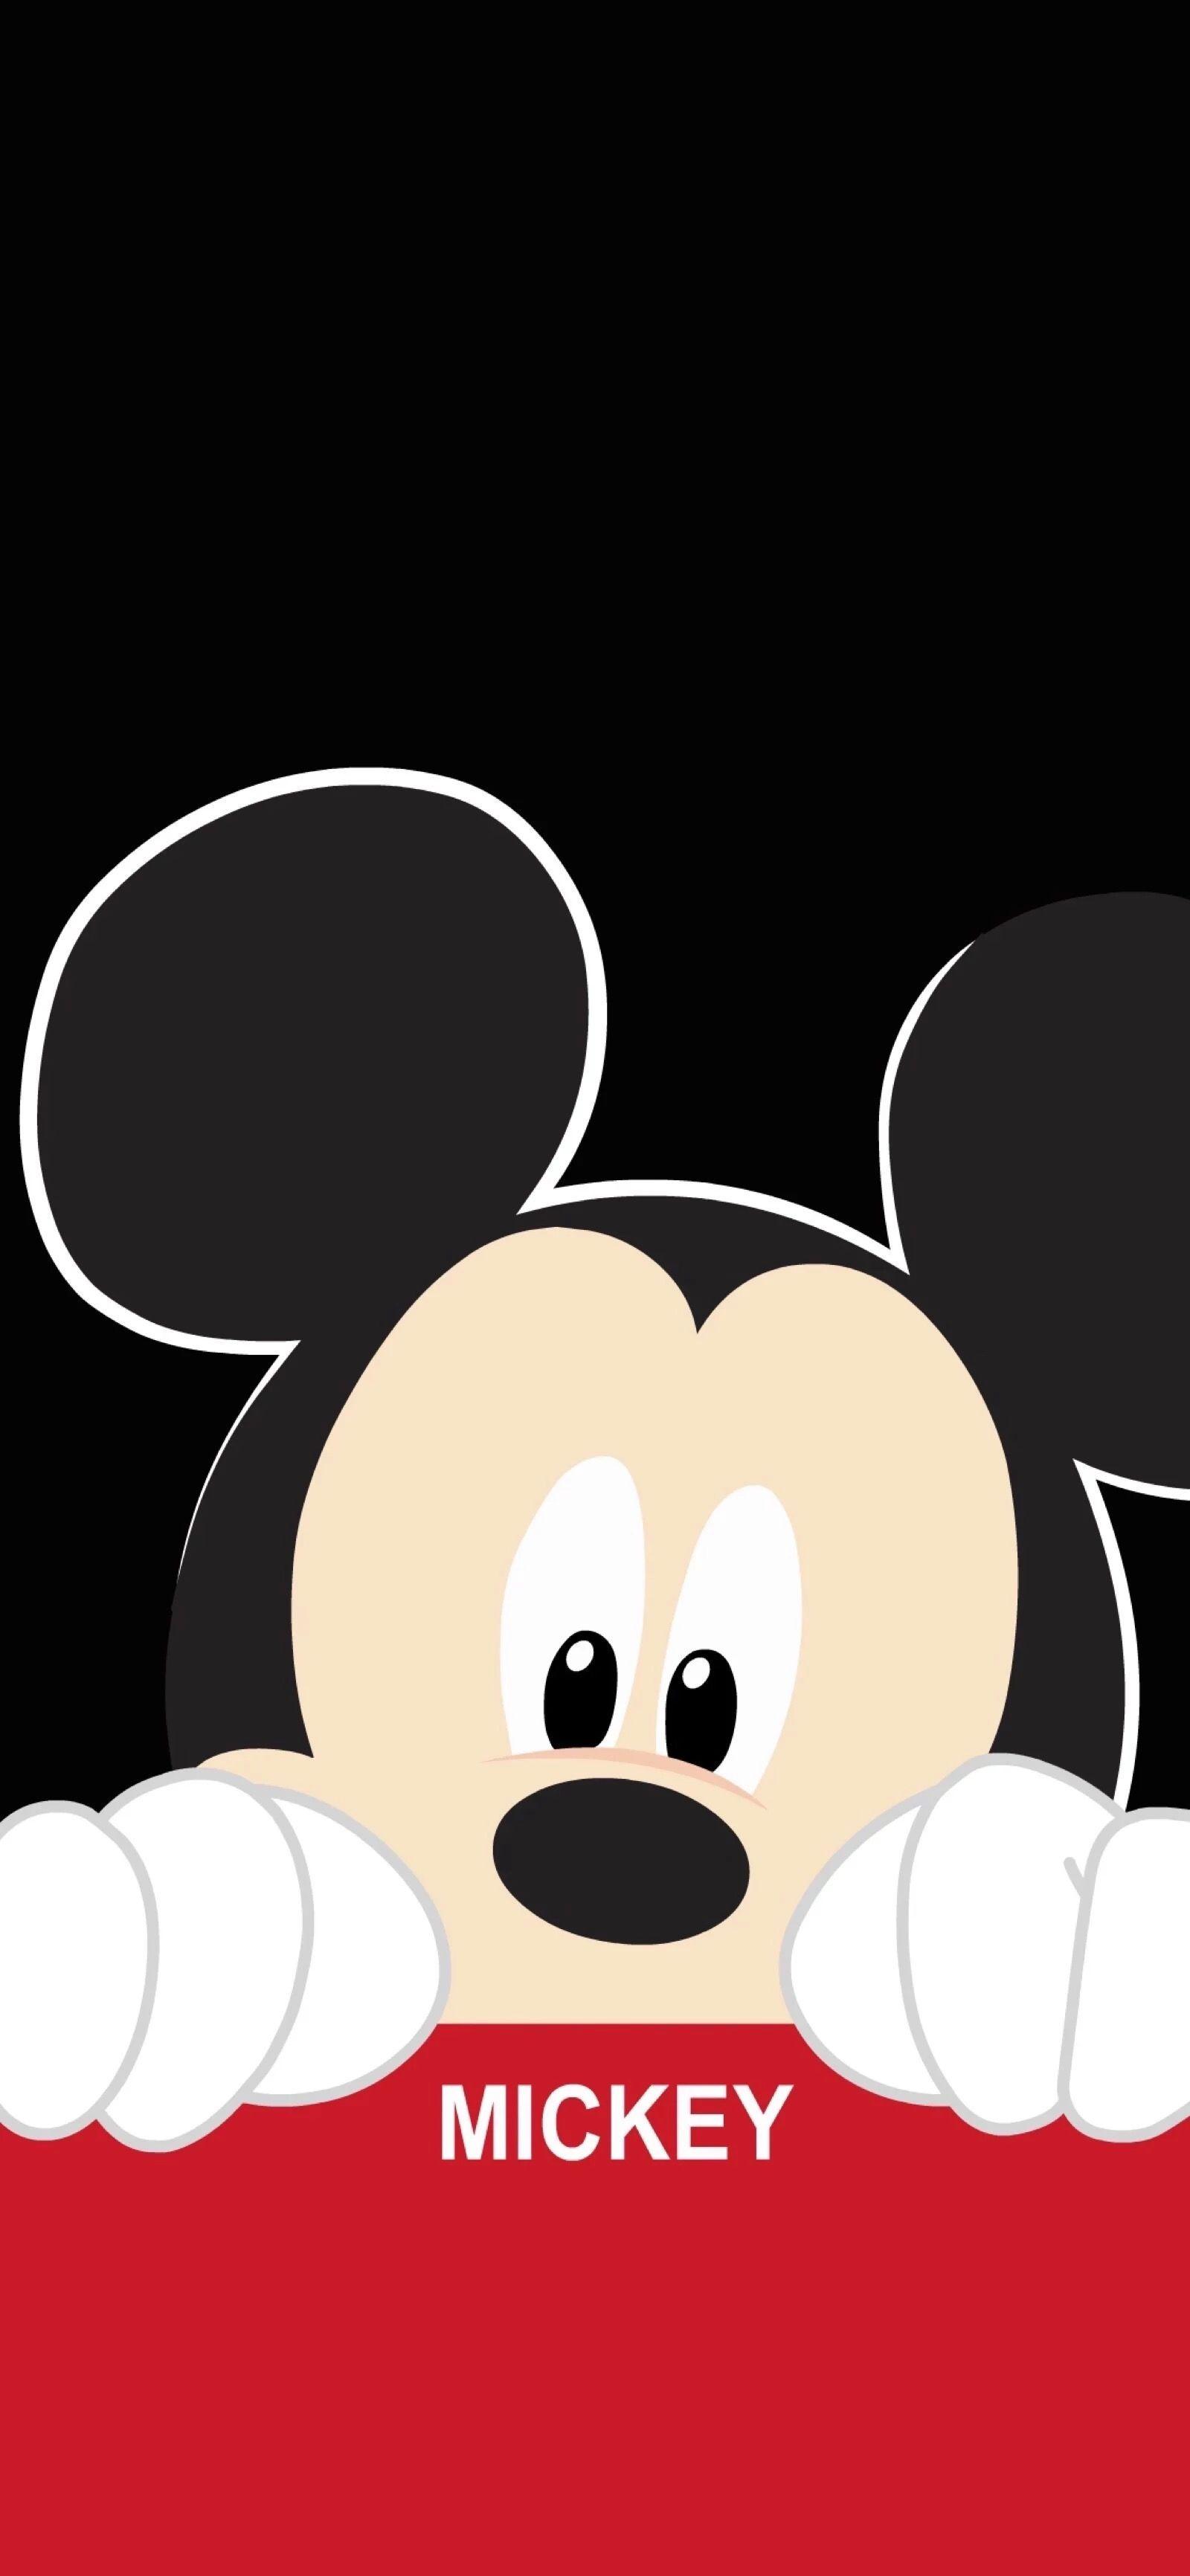 Pin De Agustya Sabana En Mickey Mouse Is In The House Part 5 Mickey Mouse Imagenes Fondo Divertido Mickey Mouse Y Amigos